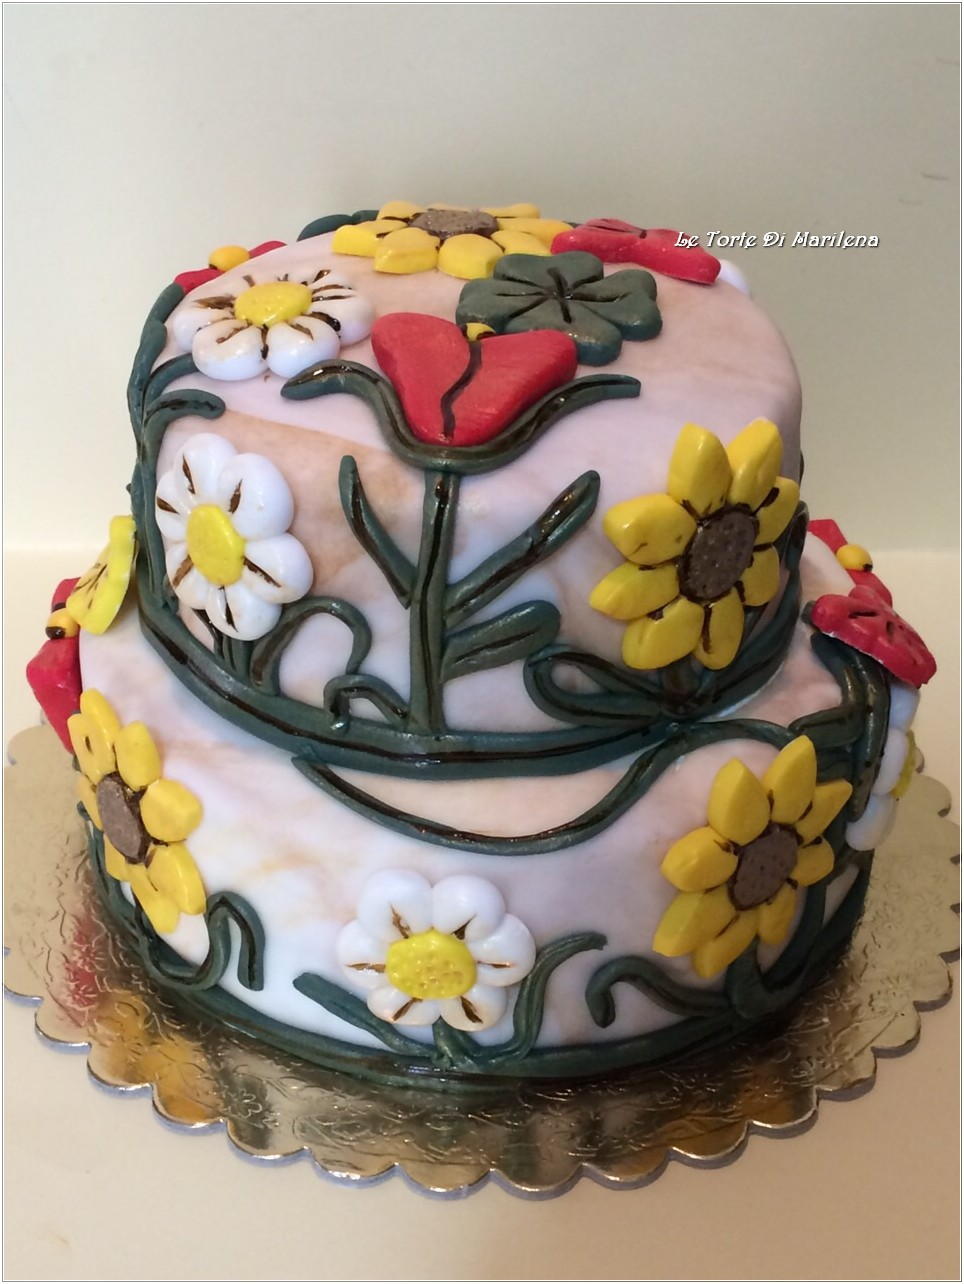 TORTA THUN  Le Torte di Marilena